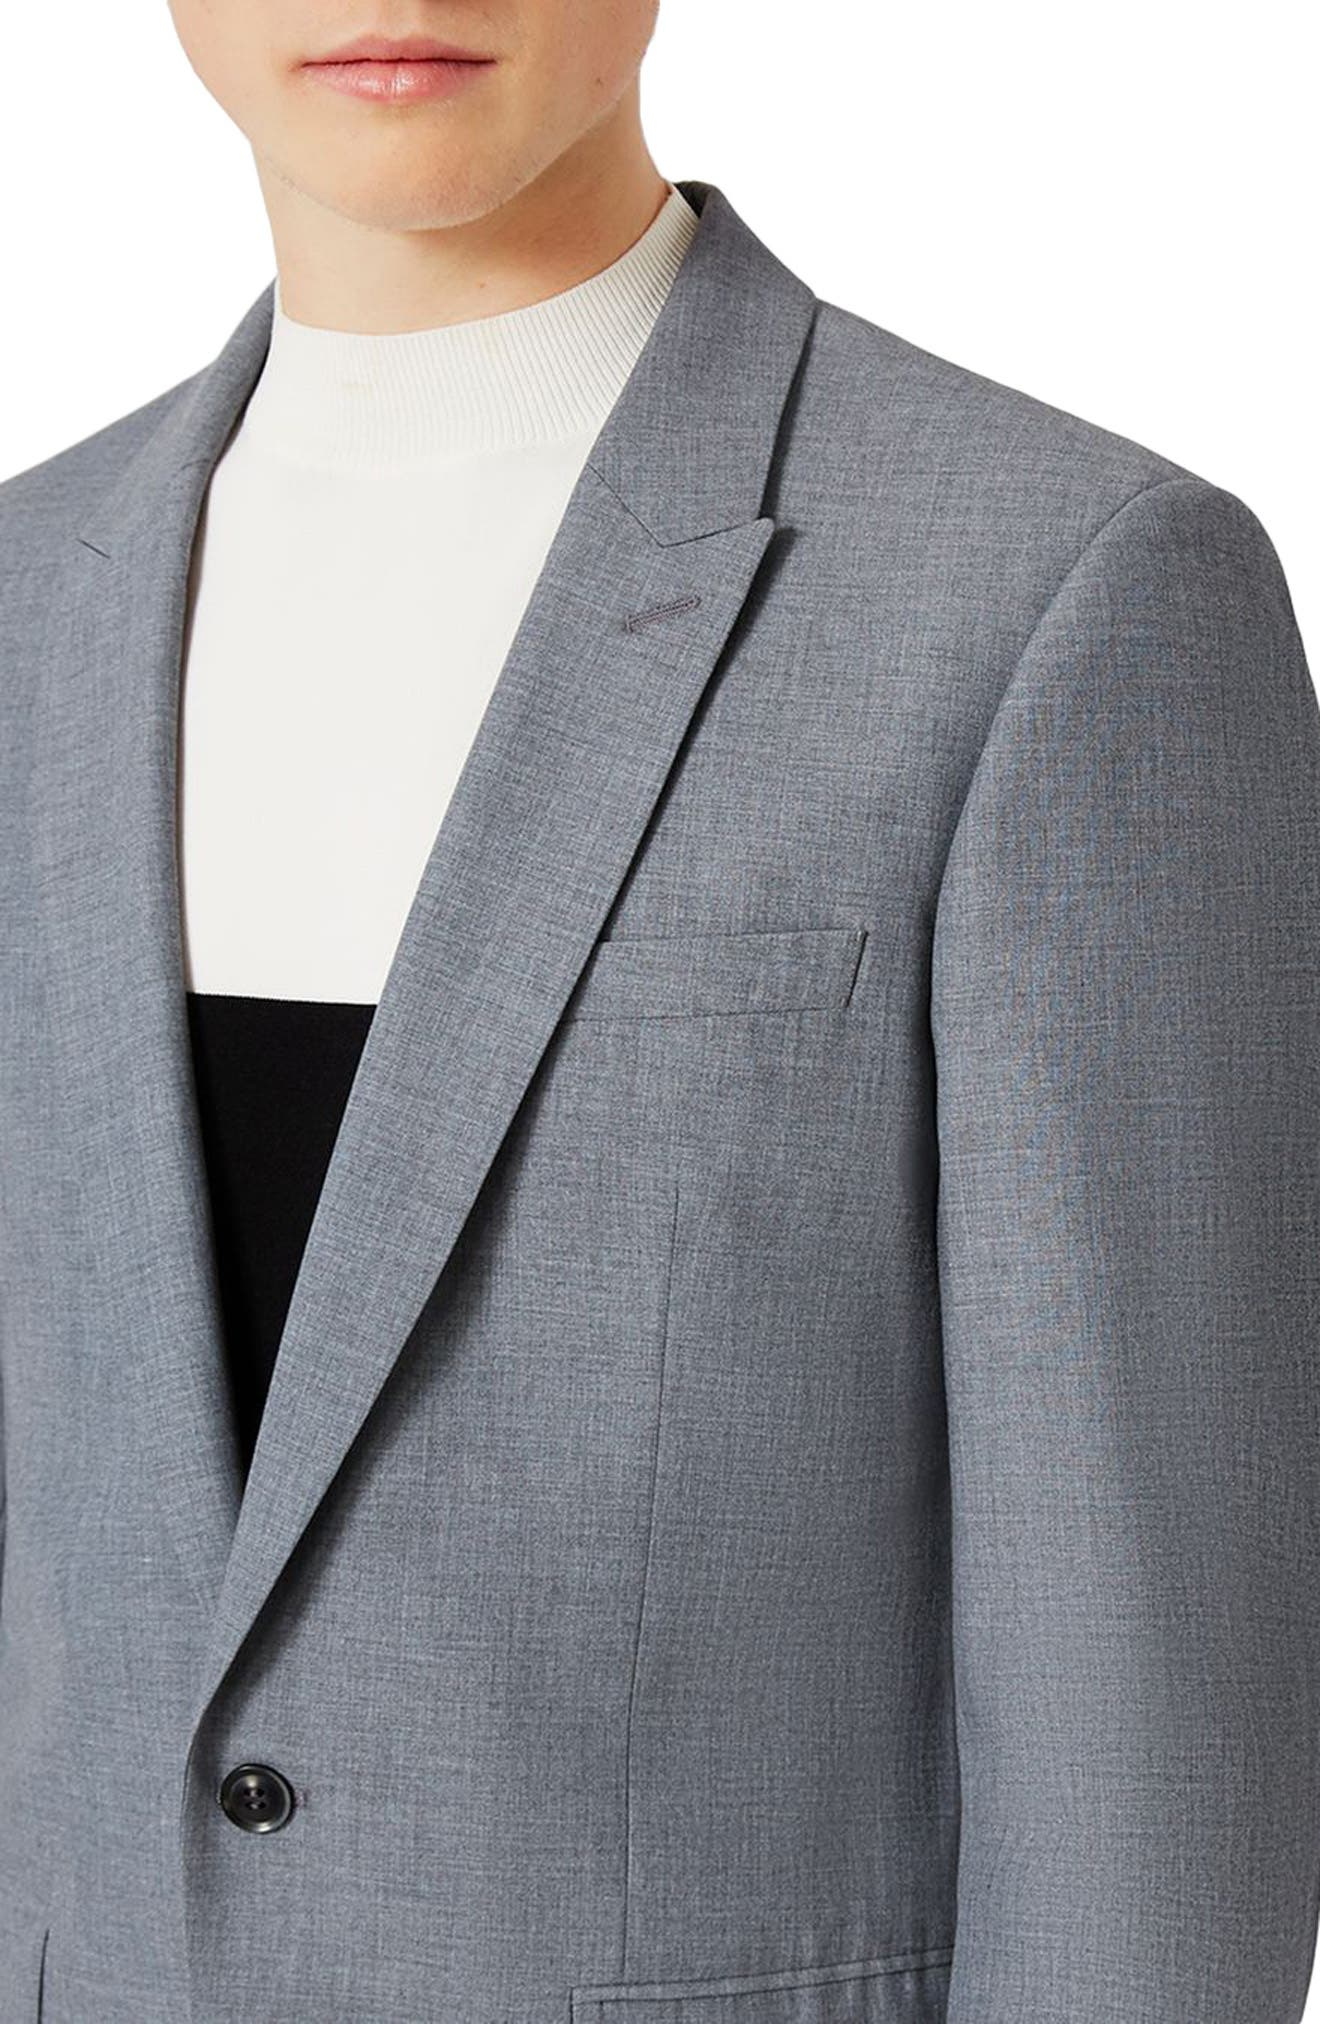 Skinny Fit Crosshatch Suit Jacket,                             Alternate thumbnail 3, color,                             Mid Blue